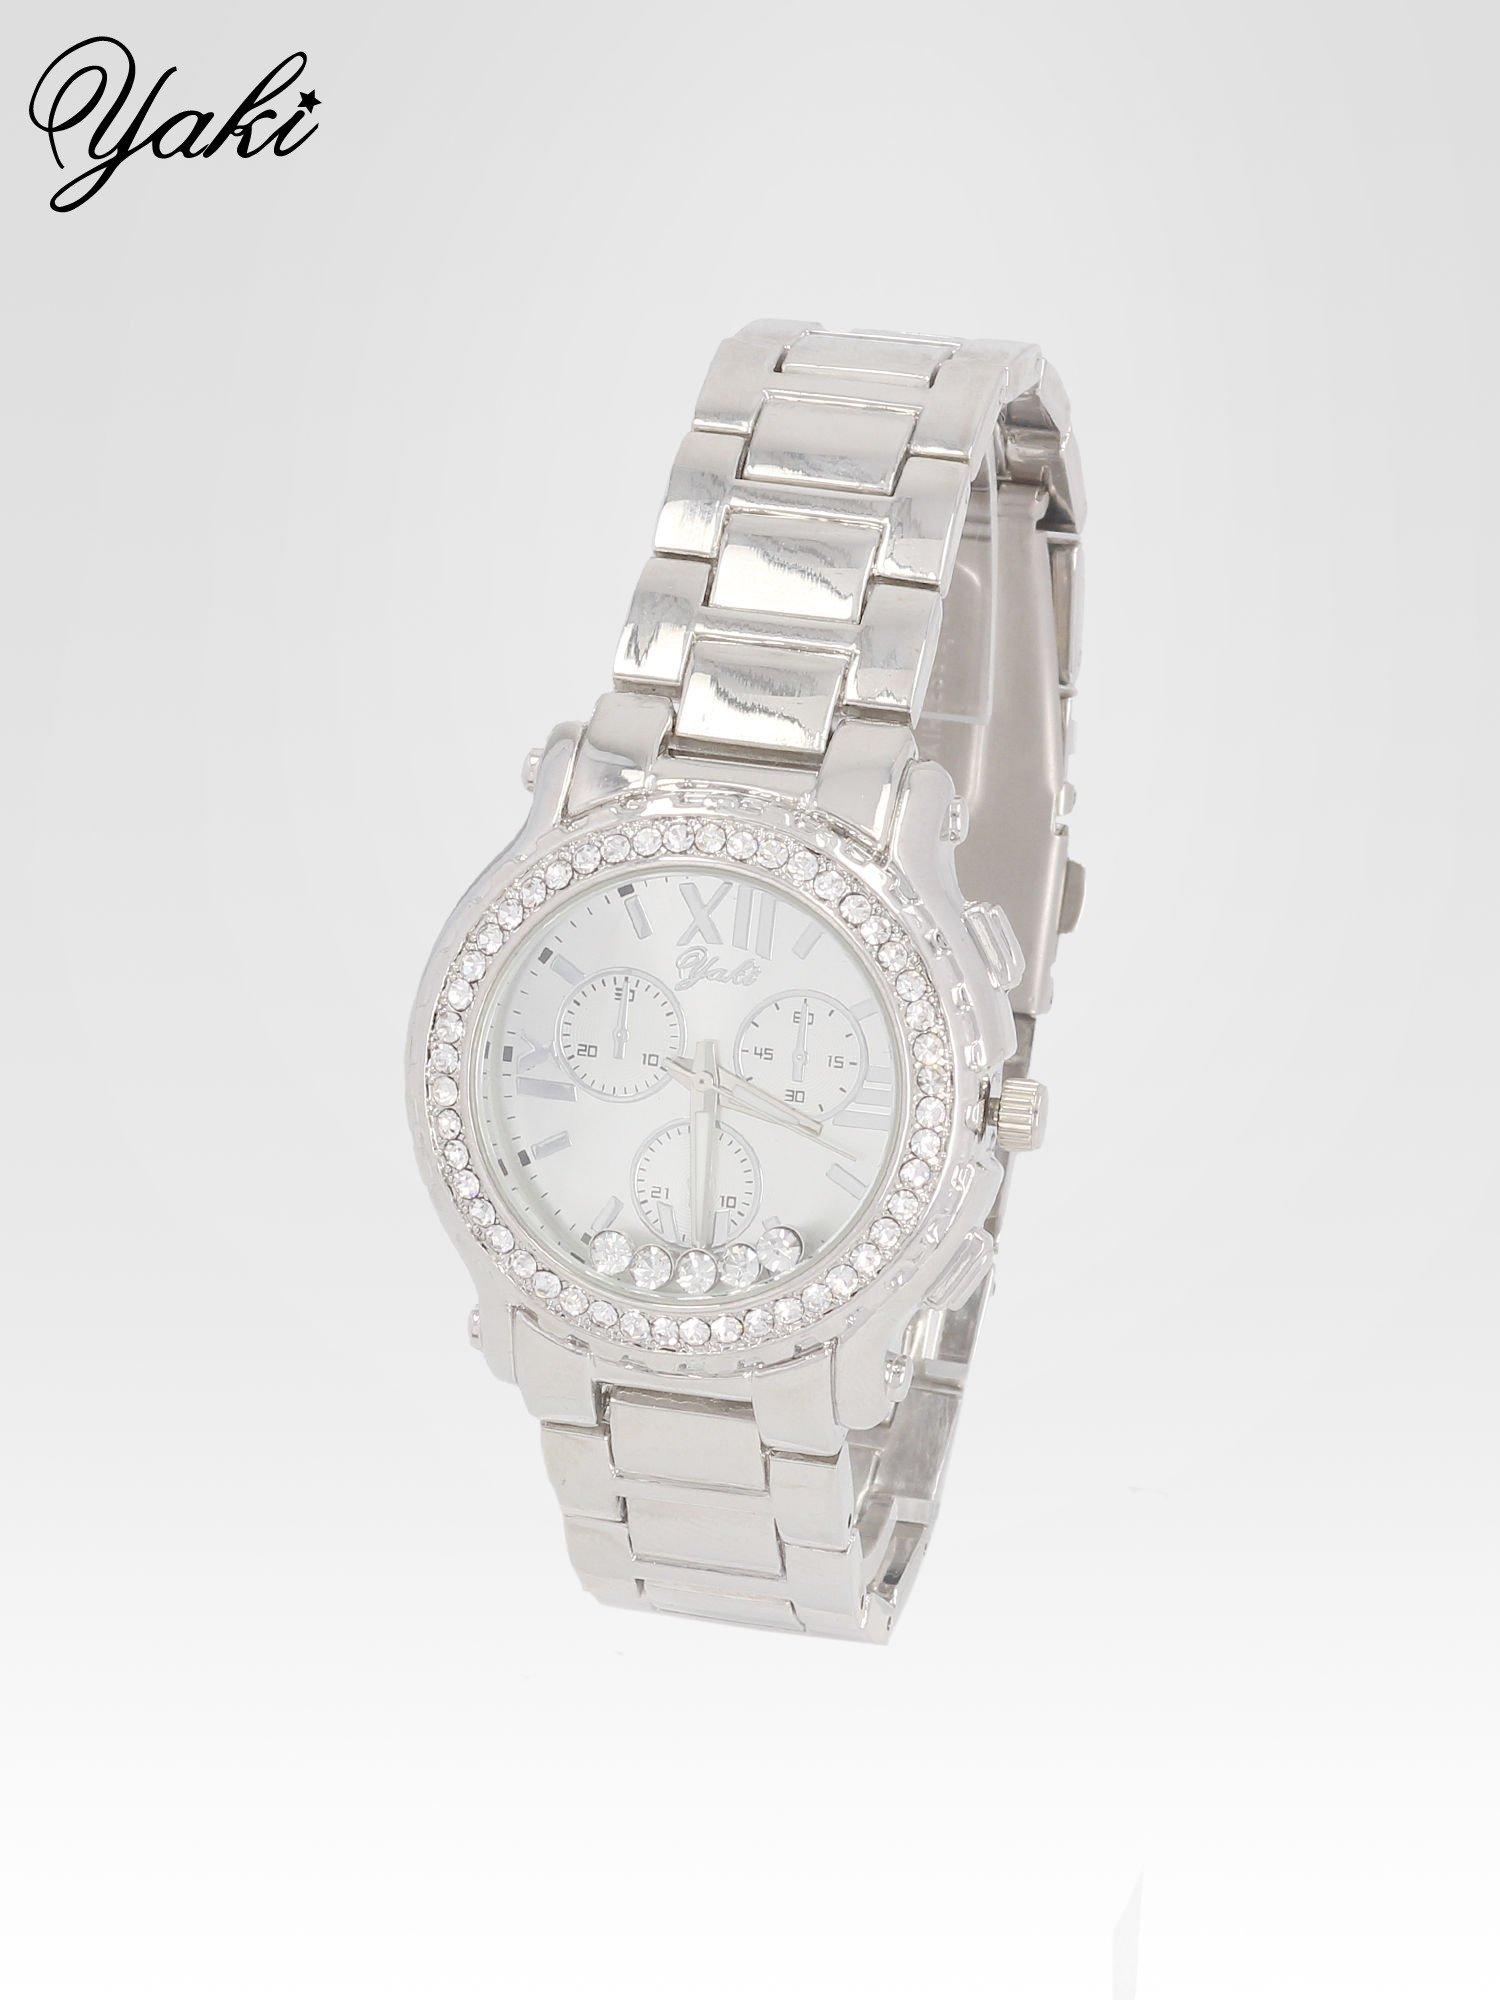 Srebrny zegarek damski na bransolecie z cyrkoniami na kopercie                                  zdj.                                  2